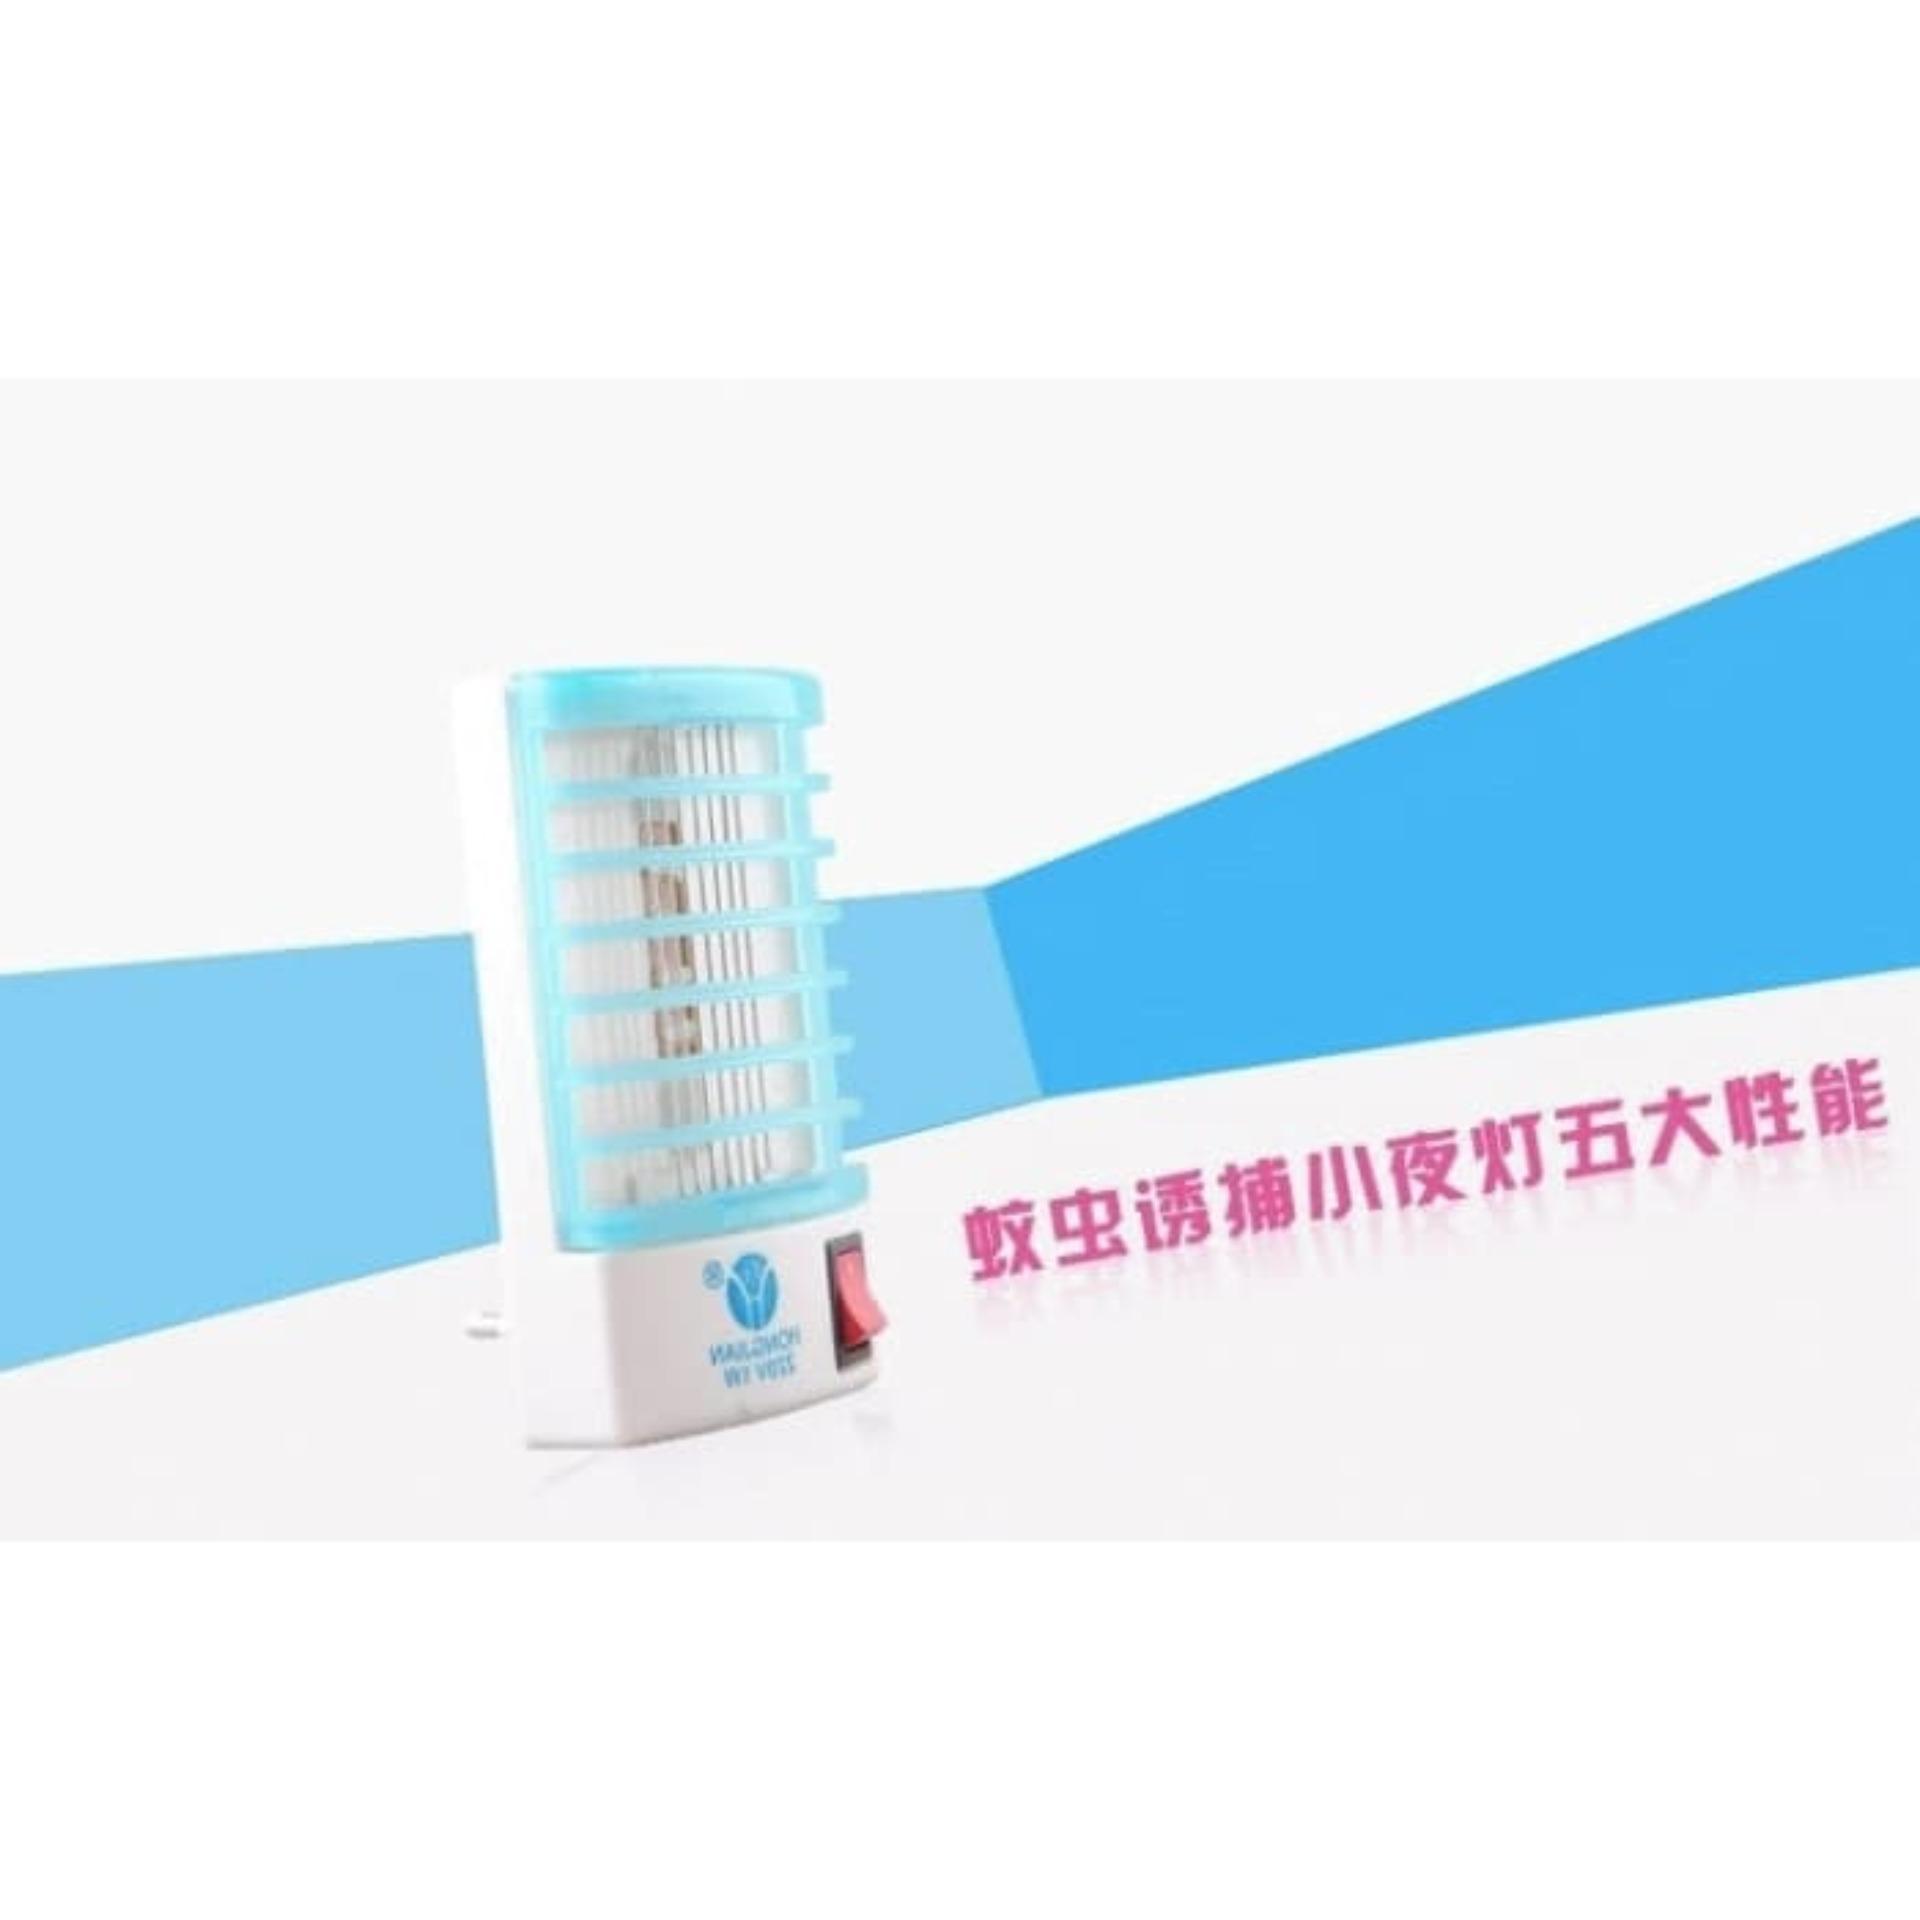 Buy Sell Cheapest Fl2181 Anti Mosquito Best Quality Product Deals Pin Nyamuk Bikit Monster Repellent Lights Lamp Alat Pembasmi Lampu Lalat